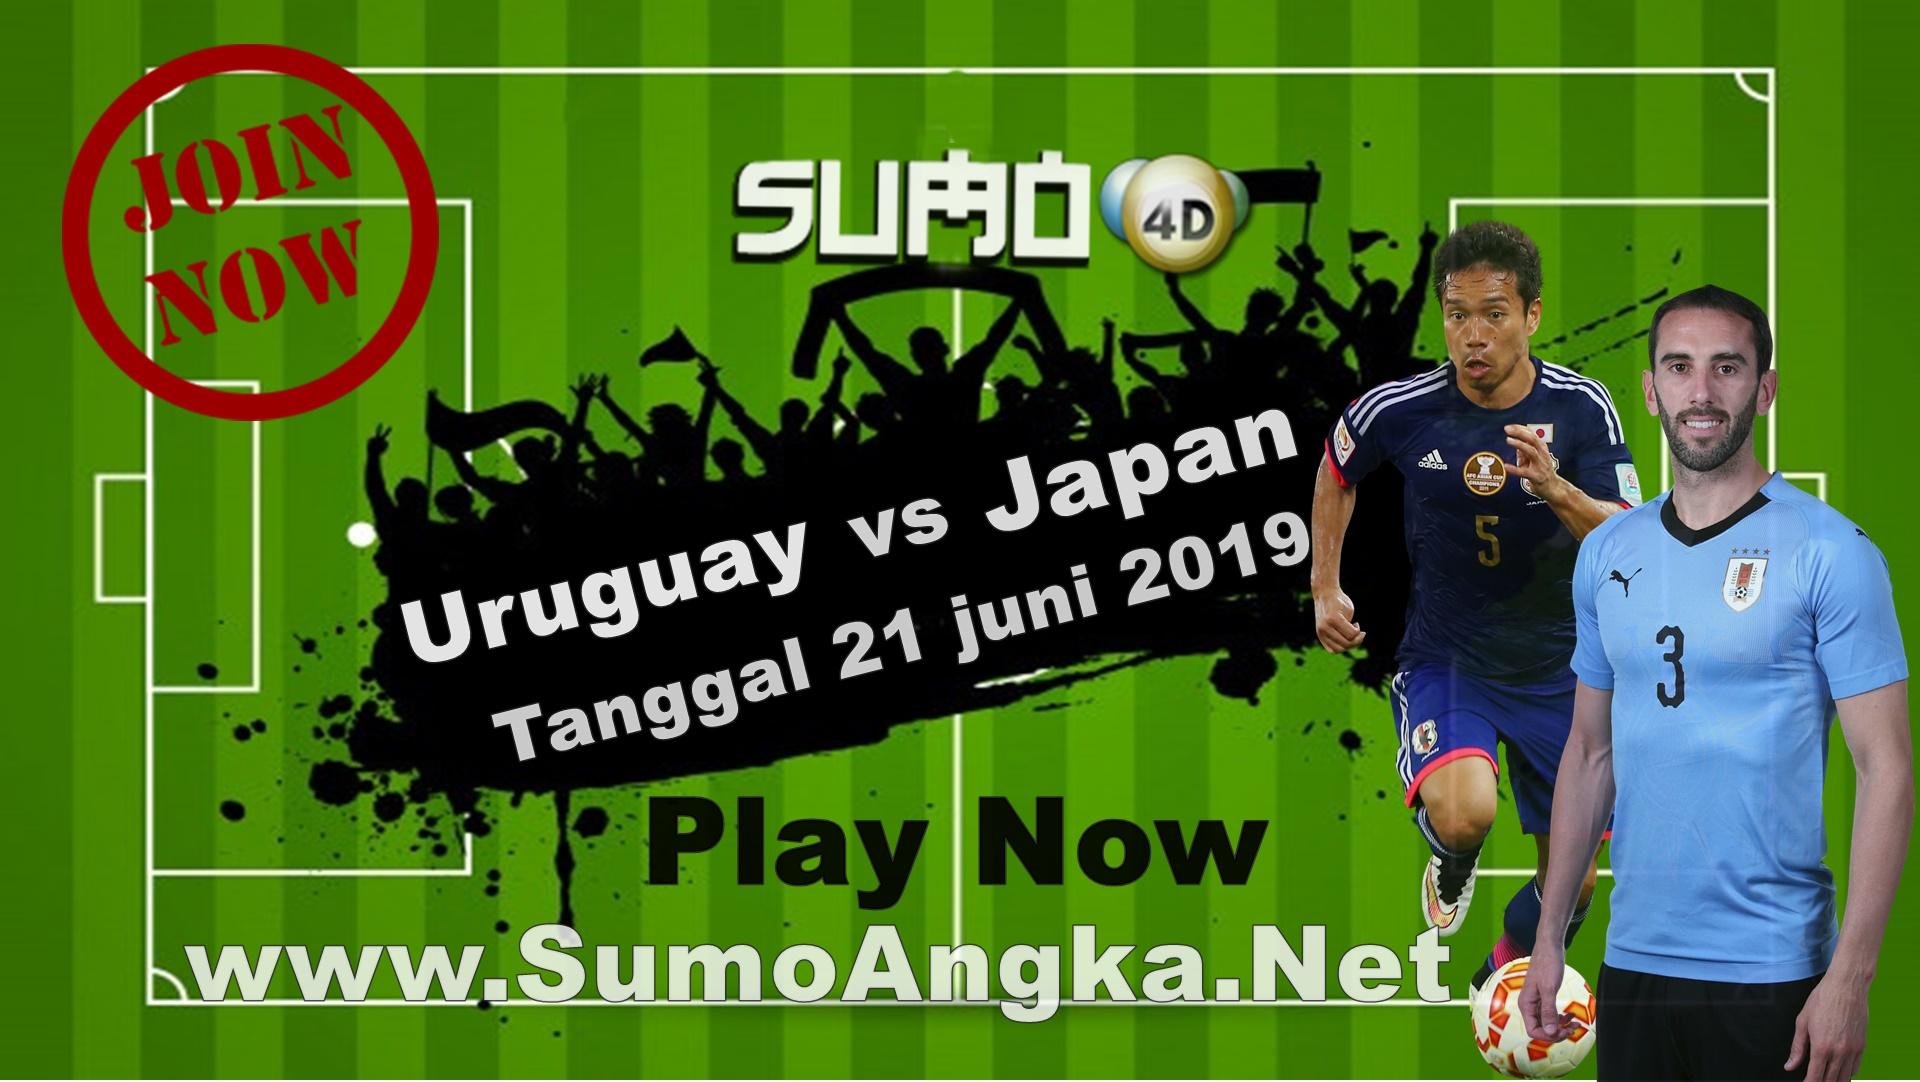 Uruguay vs Japan 21 Juni 2019 Copa America Cup